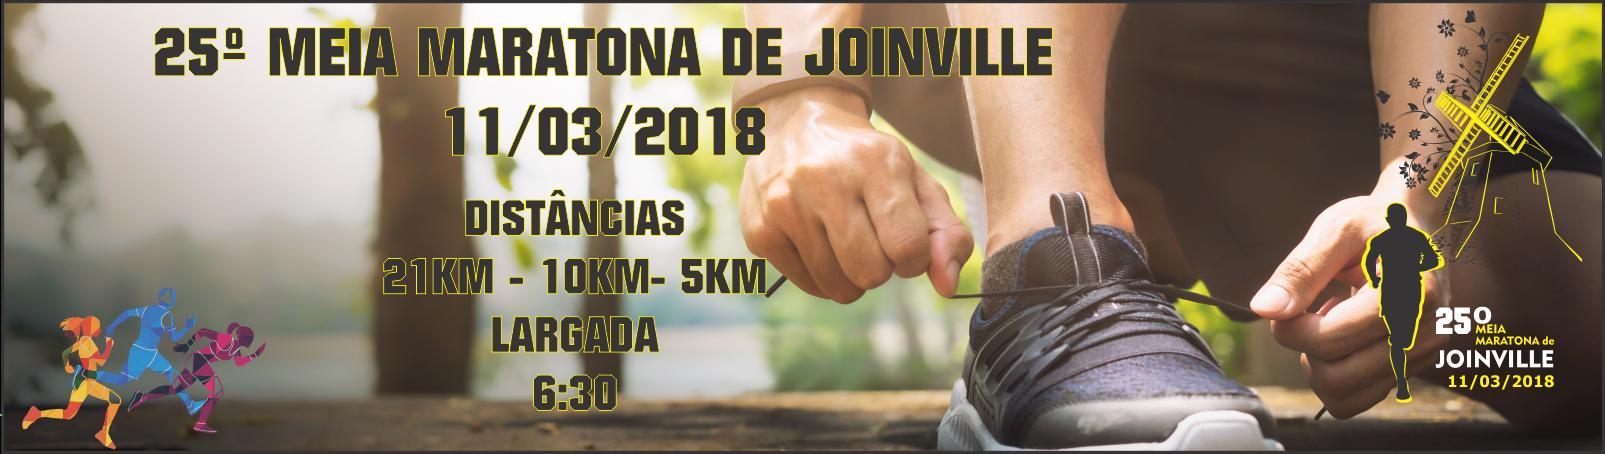 25ª MEIA MARATONA DE JOINVILLE - 2018 - Imagem de topo